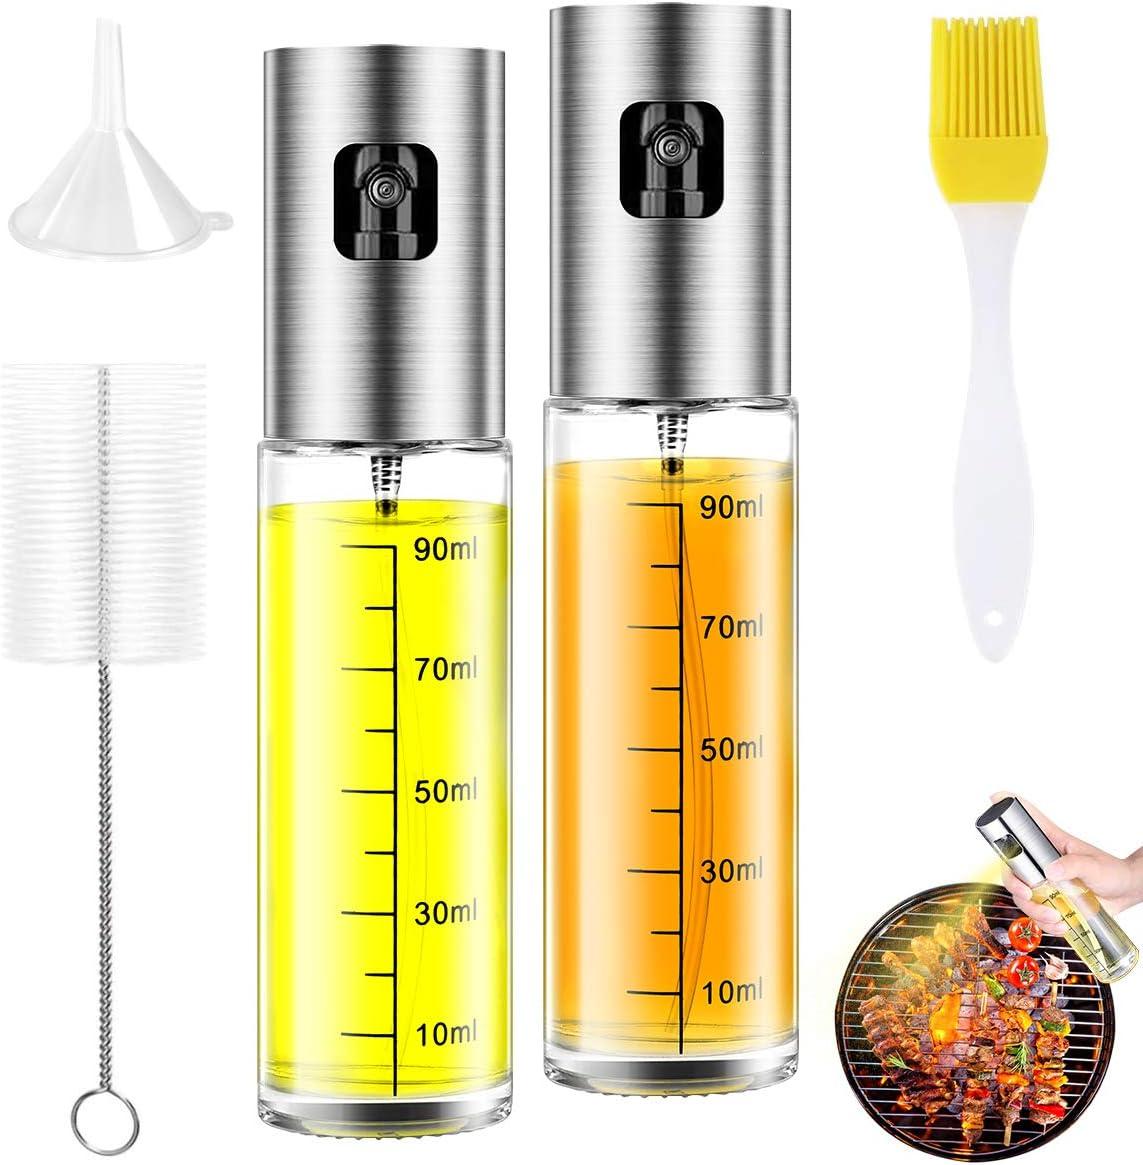 Oil Sprayer for Cooking 2 Pack, JOMARTO 100ml Olive Oil Spray Mister Set Glass Oil Bottle with Measurements Refillable Oil Dispenser for Kitchen Air Fryer BBQ Salad Baking Grilling Roasting: Home Improvement